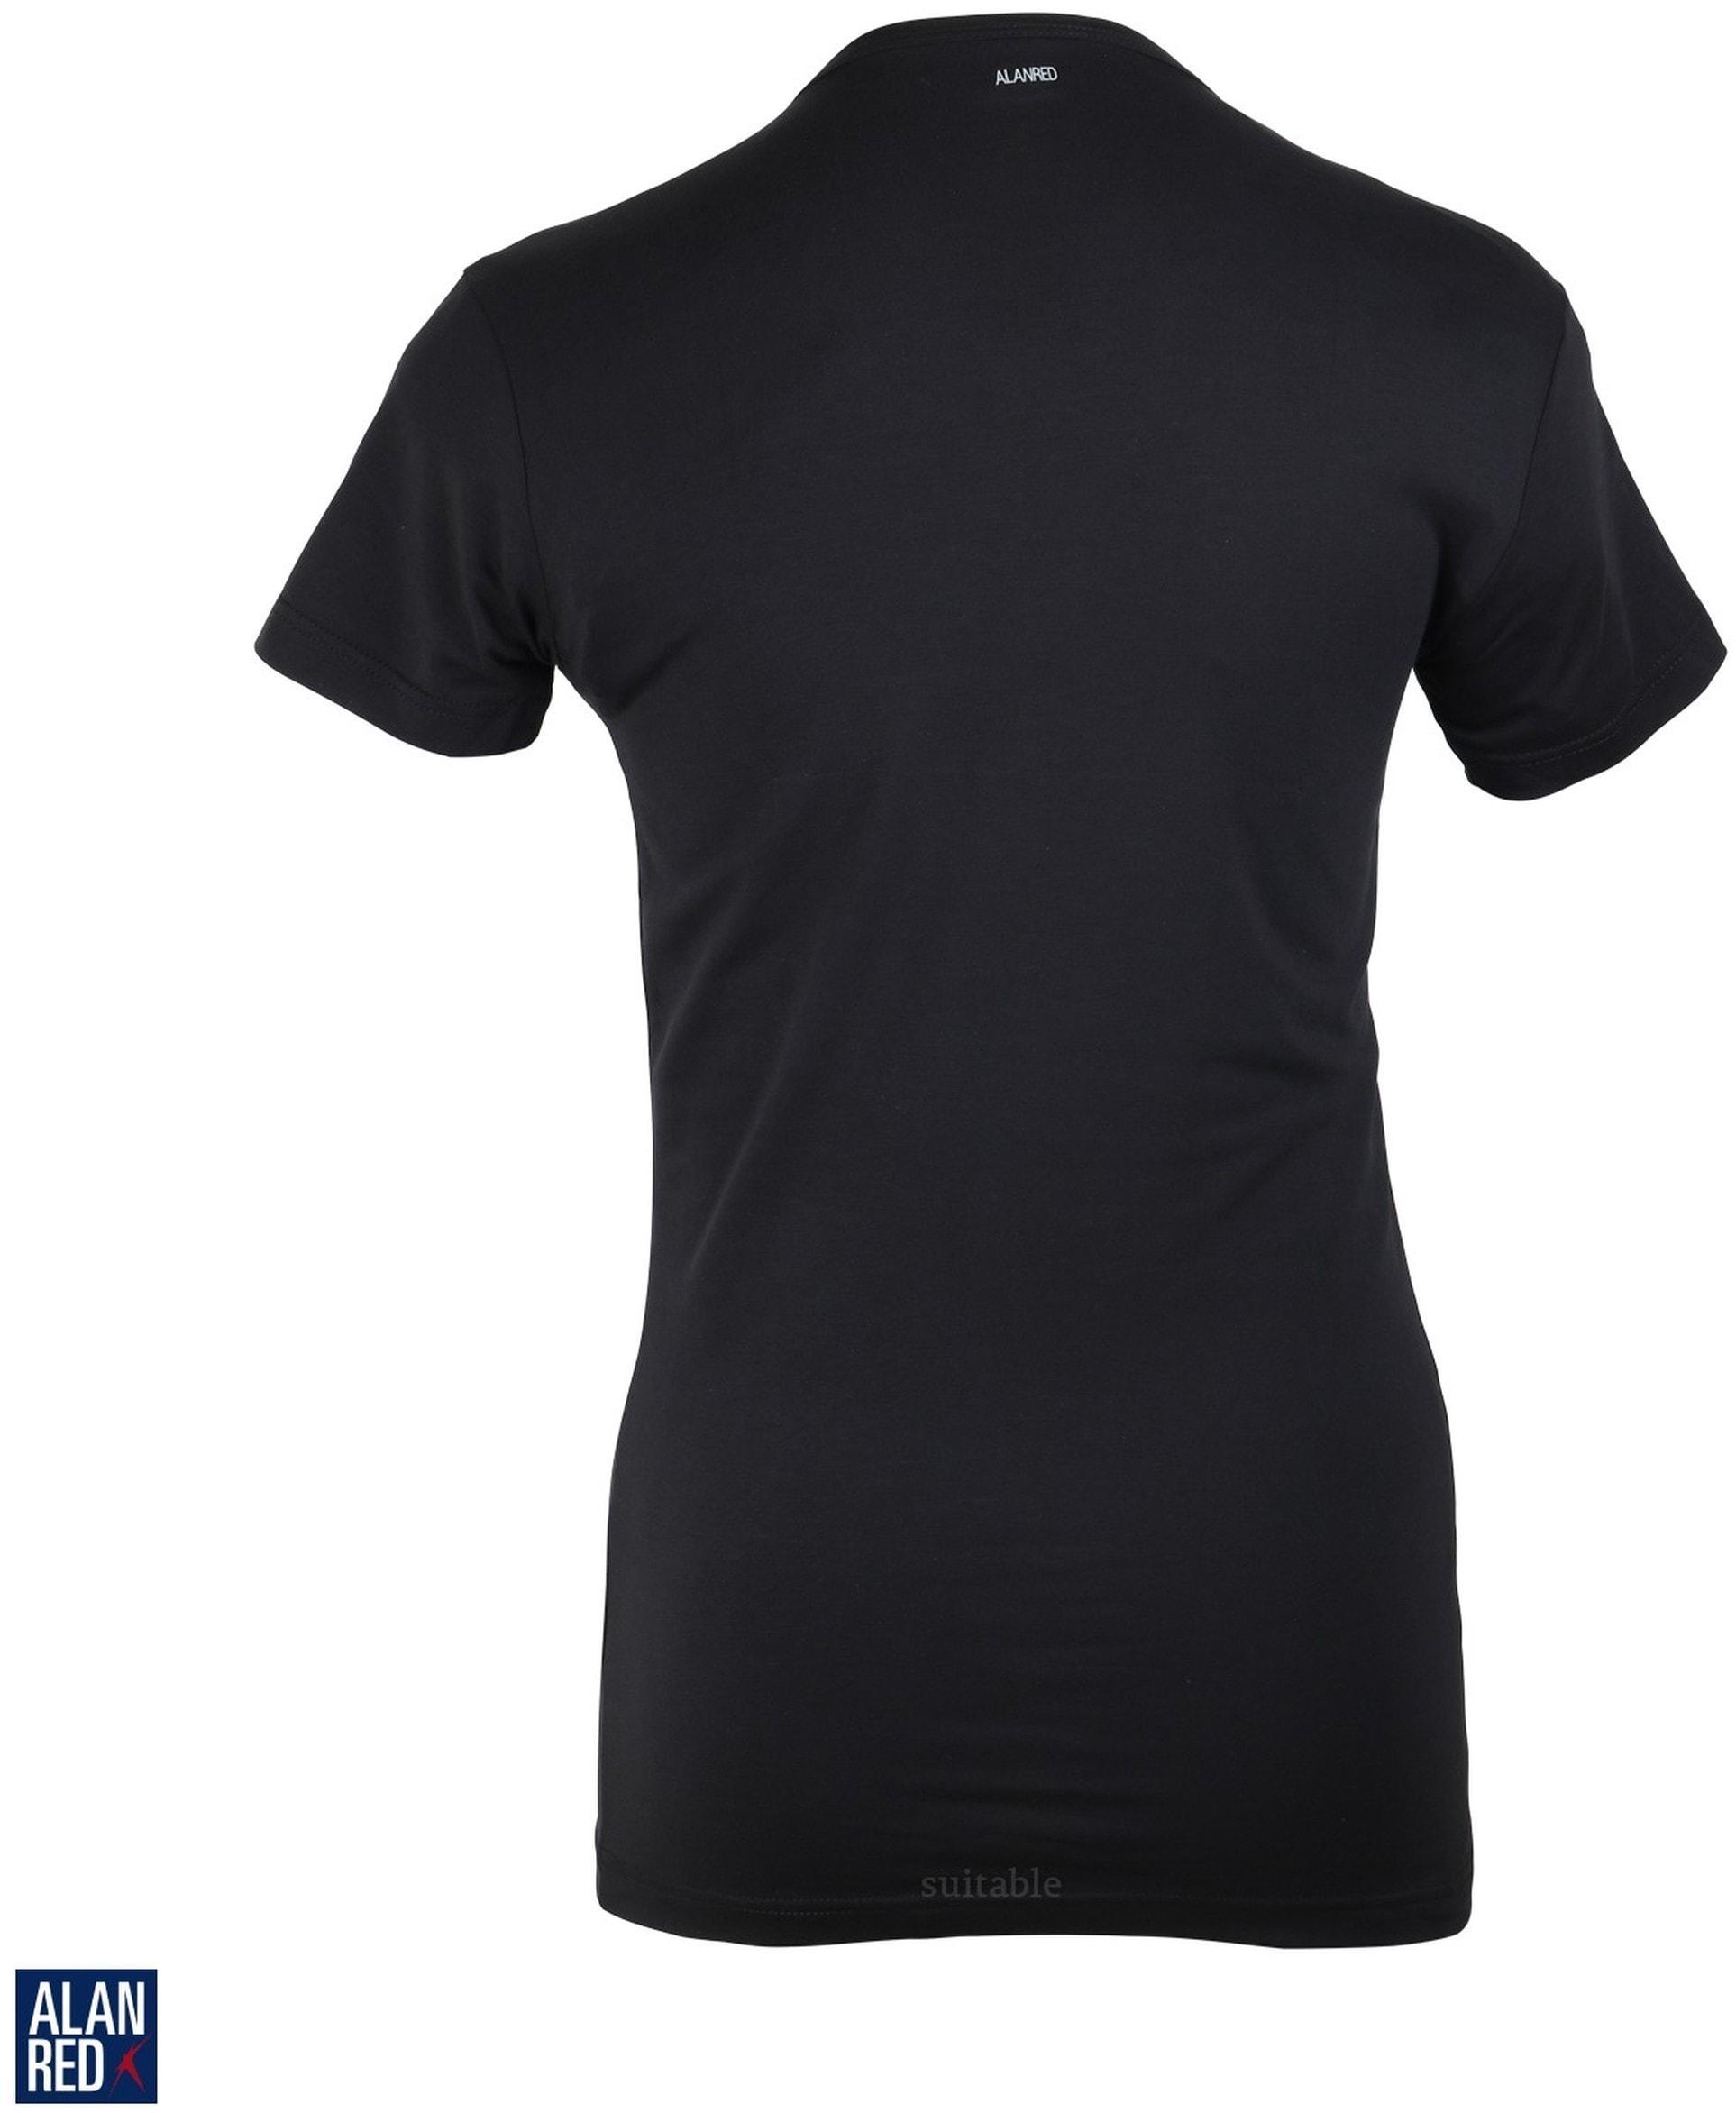 Alan Red Ottawa T-shirt Stretch Zwart (1Pack) foto 1